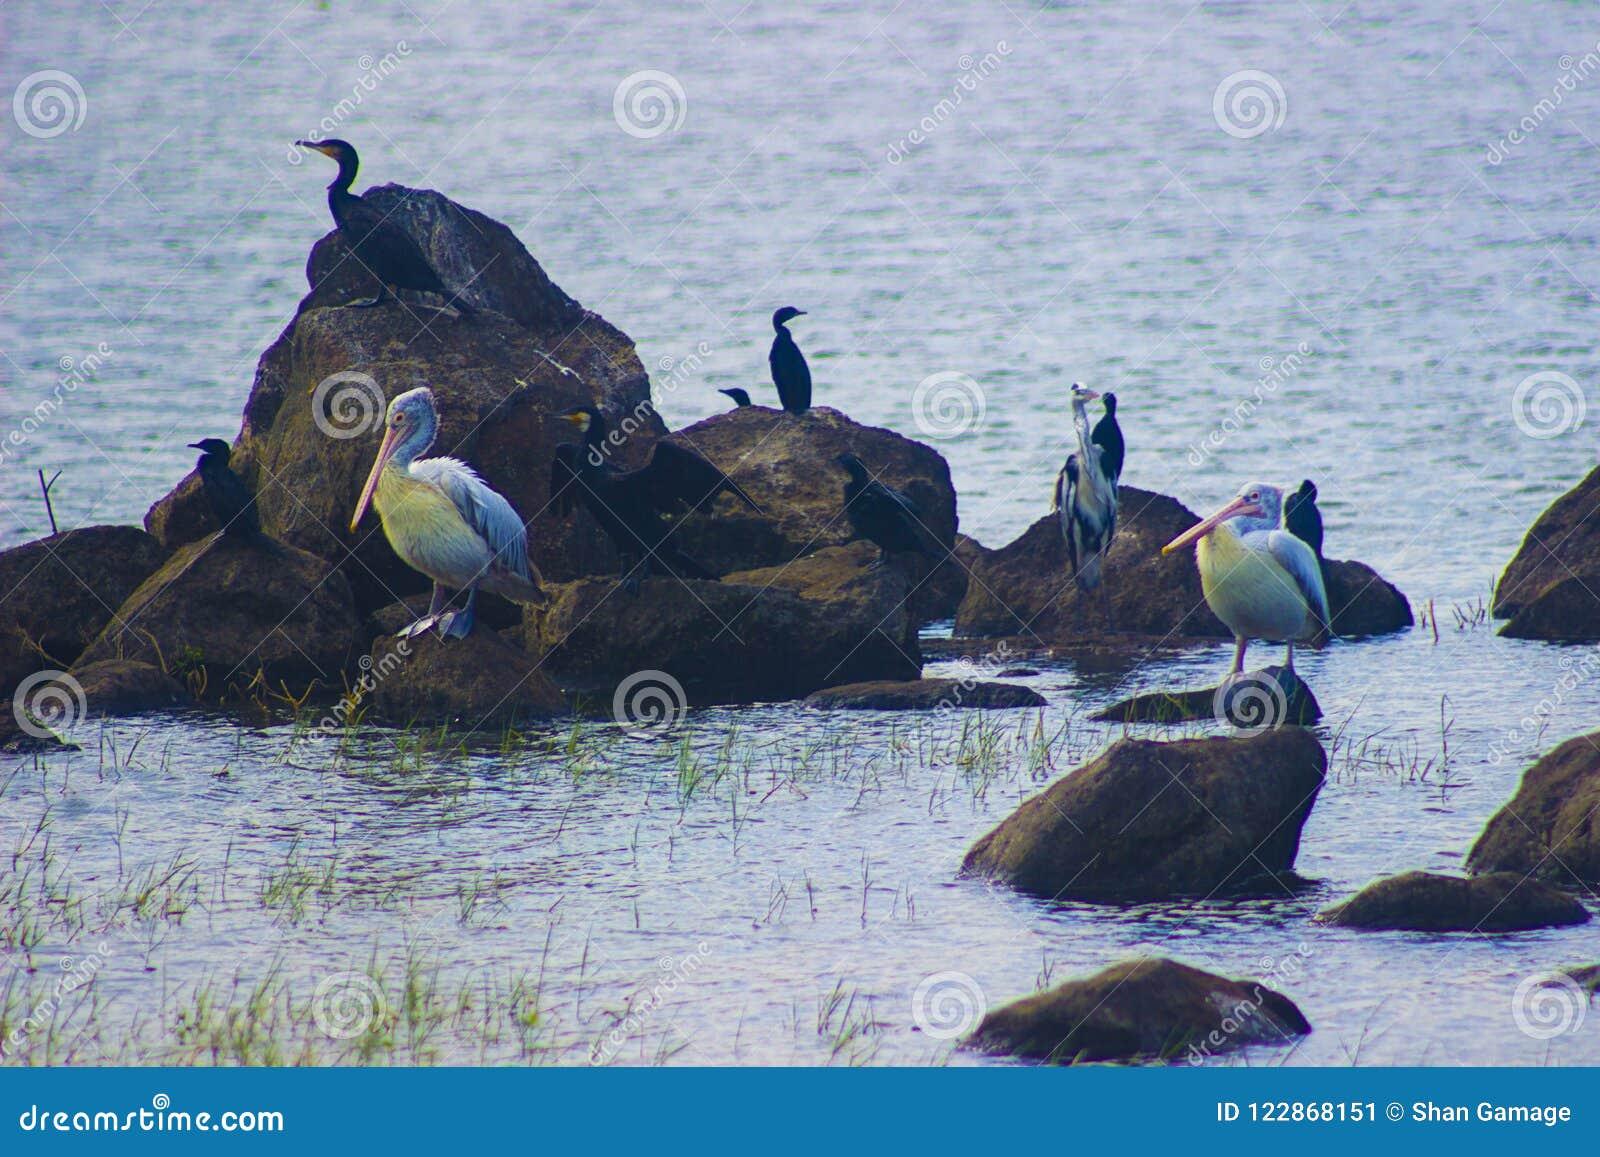 Птичий заповедник Шри-Ланка Attidiya